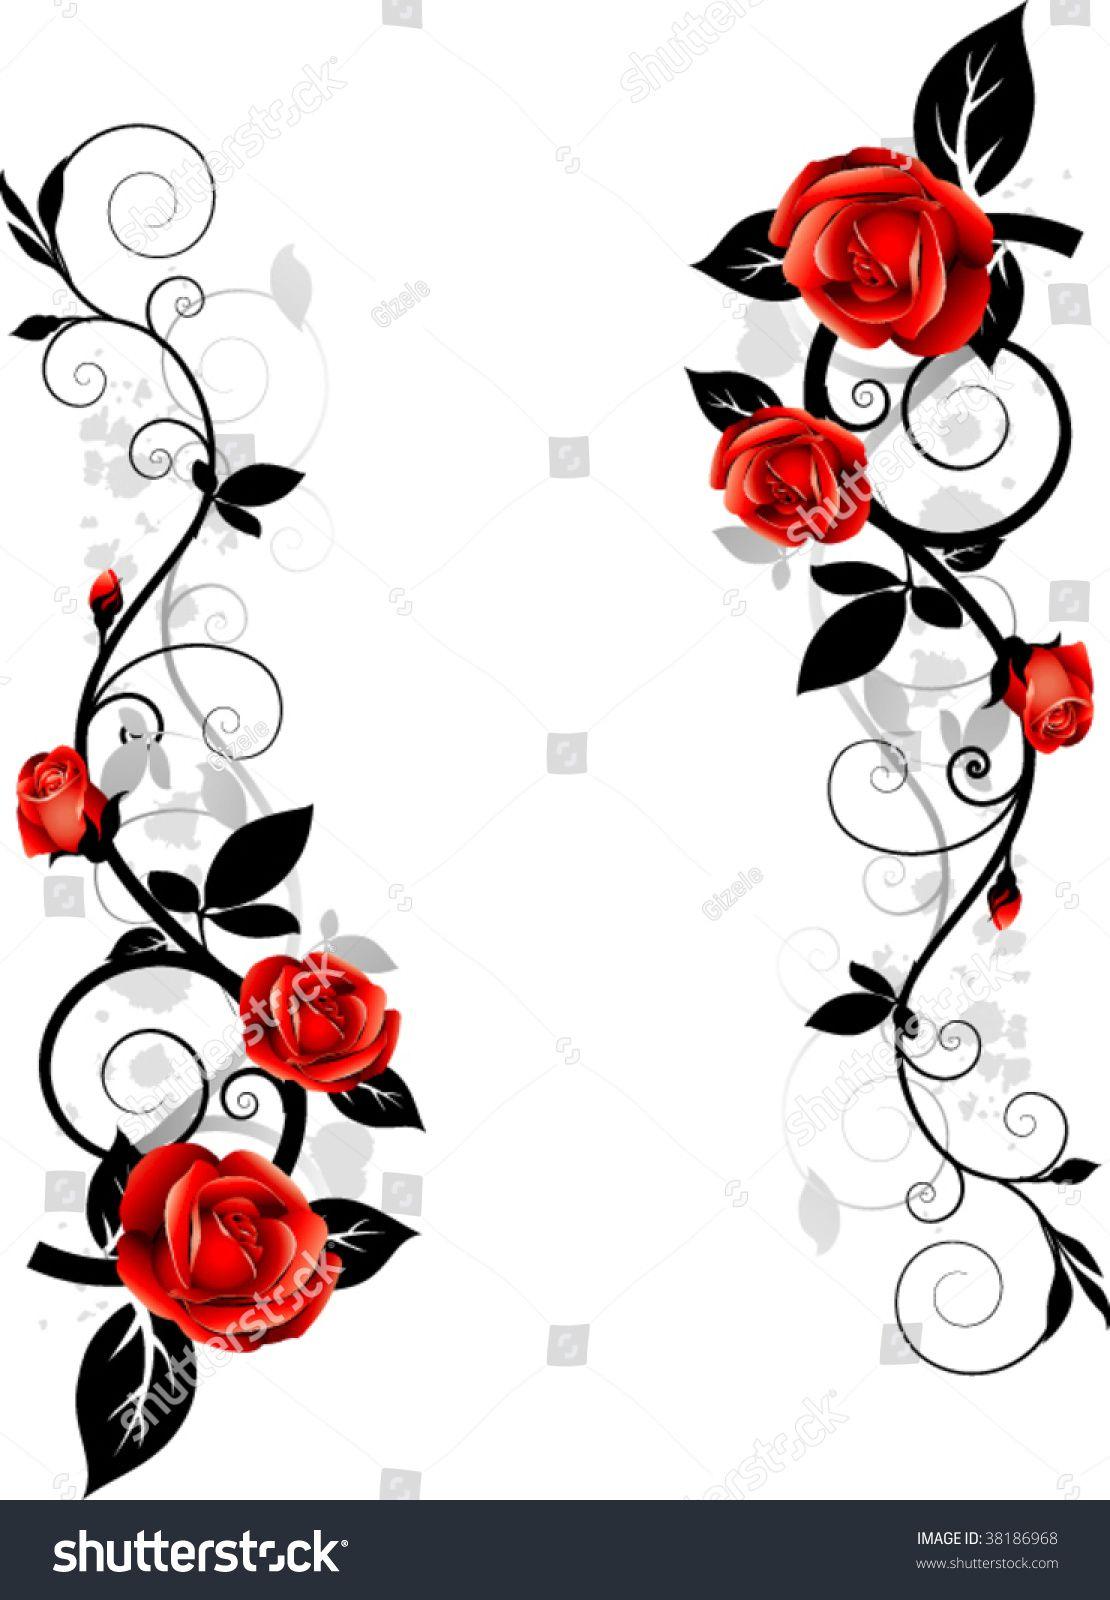 Vector floral design. Ornament with roses Rose vine